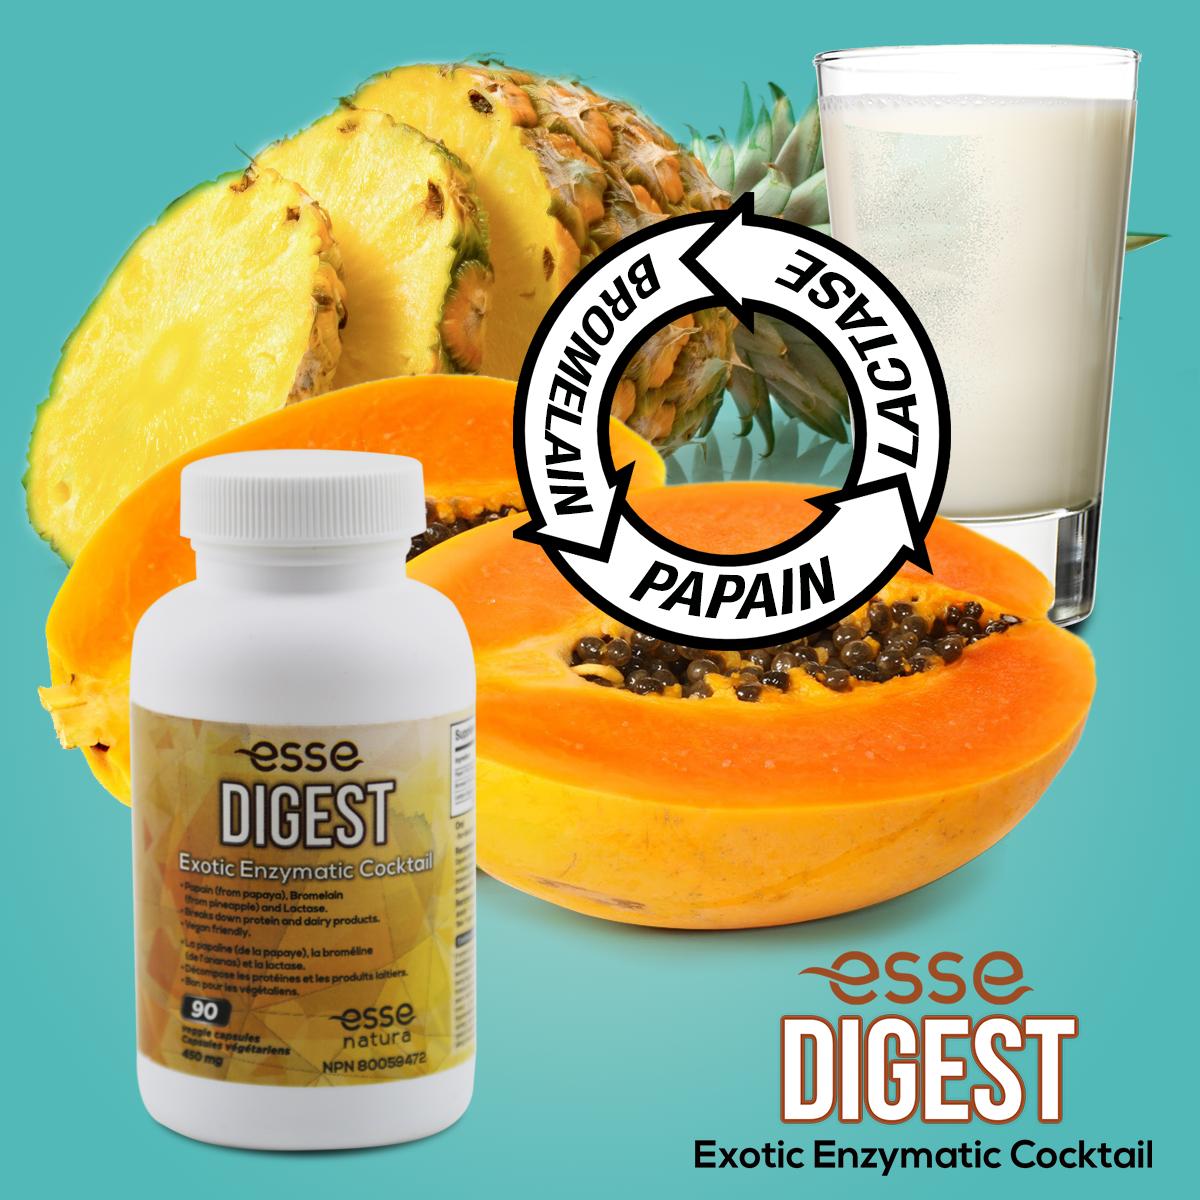 Enzymes in Esse Digest